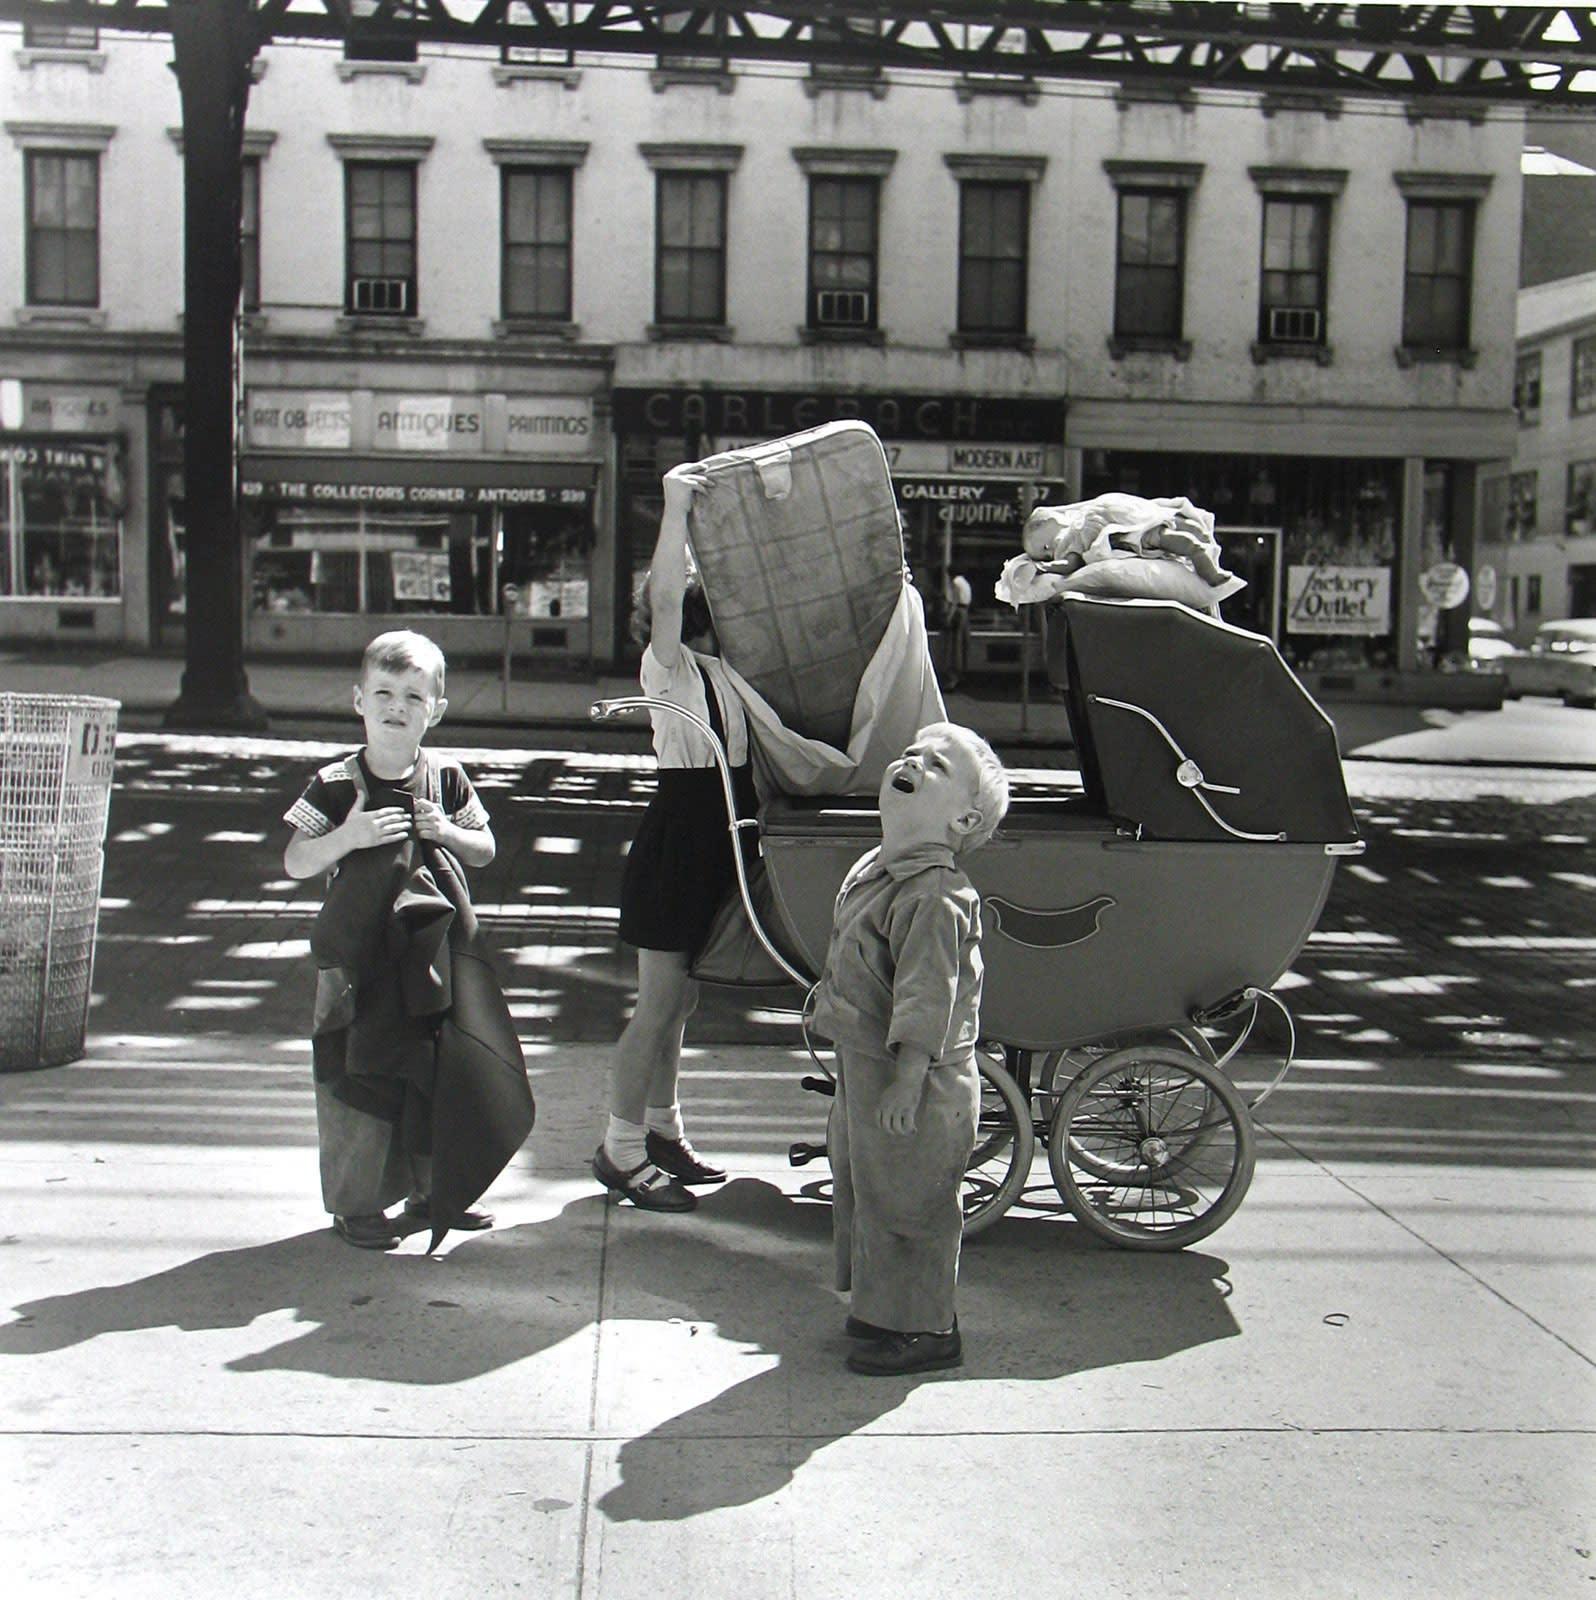 Vivian Maier New York, NY, September Tirage gélatino-argentique, posthume 30 x 30 cm Dim. papier: 40 x 50 cm